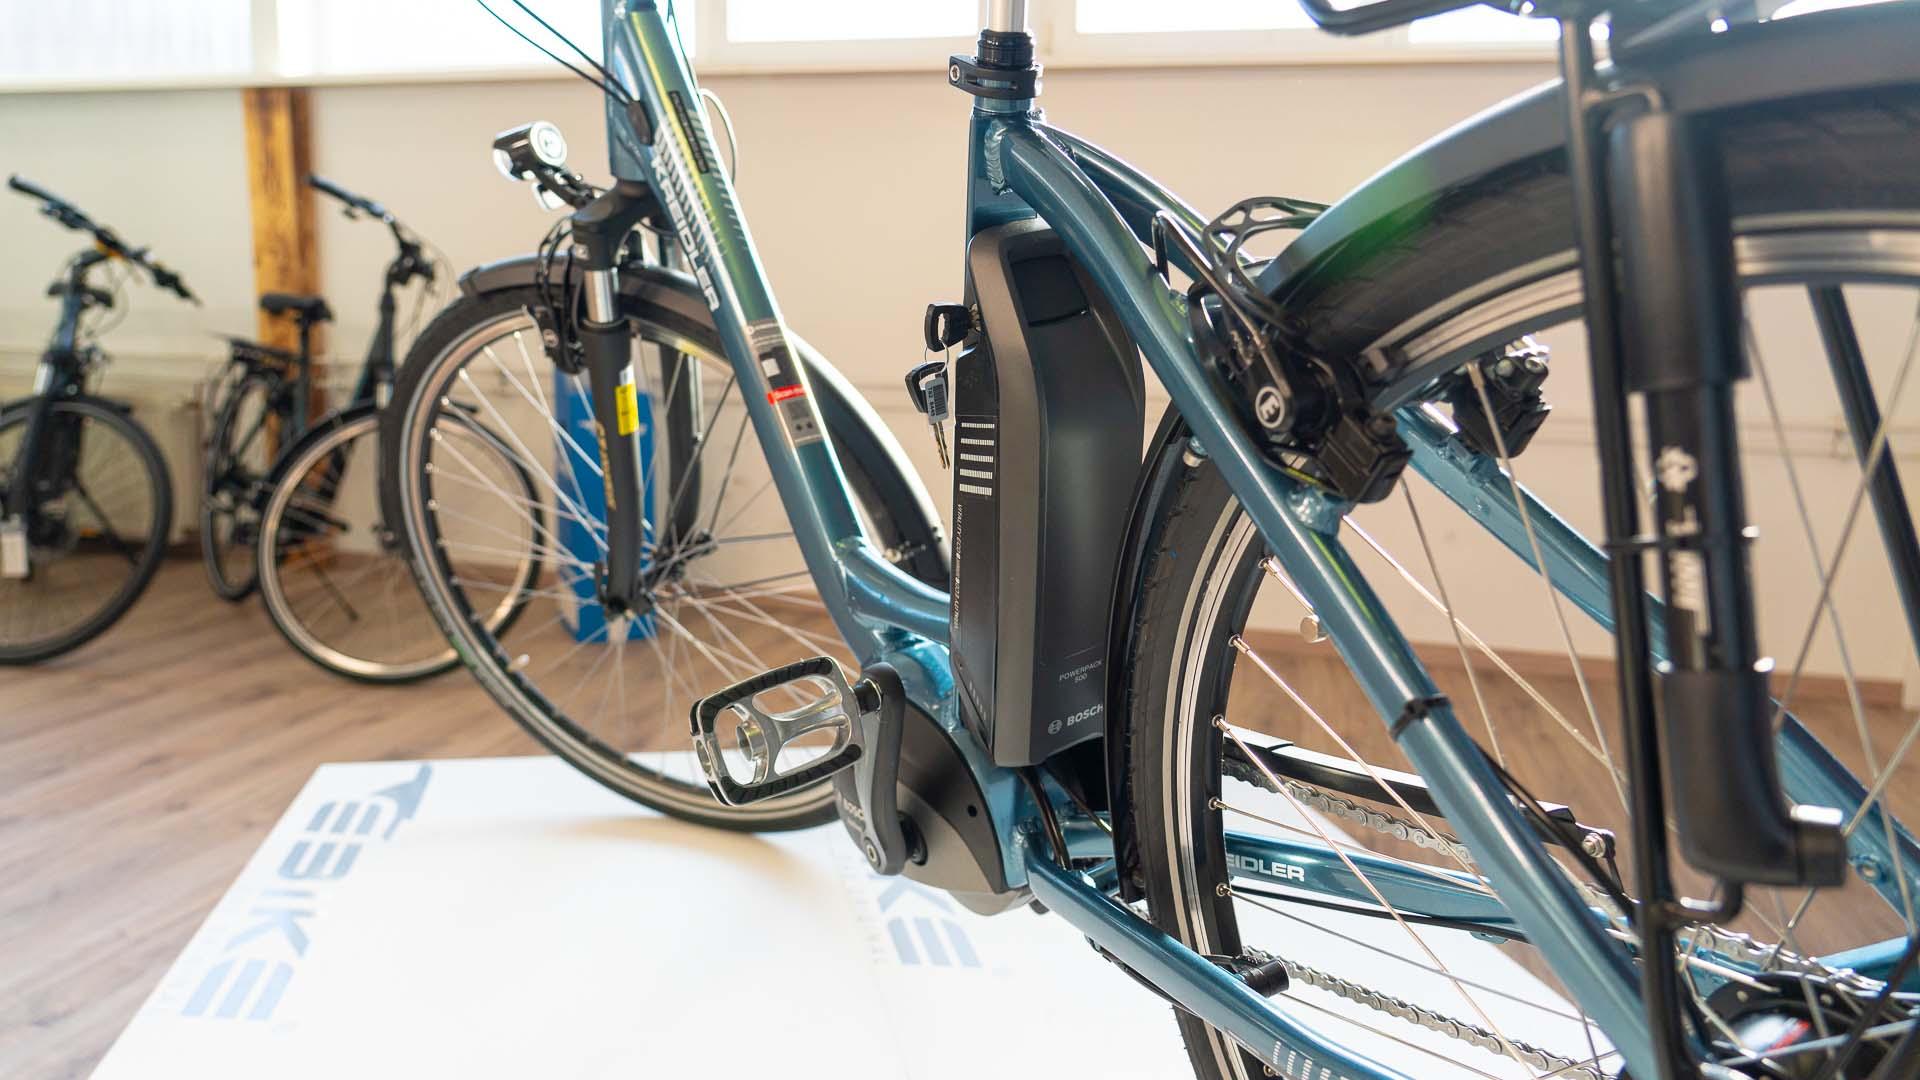 Fahrradzentrum Grauthoff Fotoshooting 26